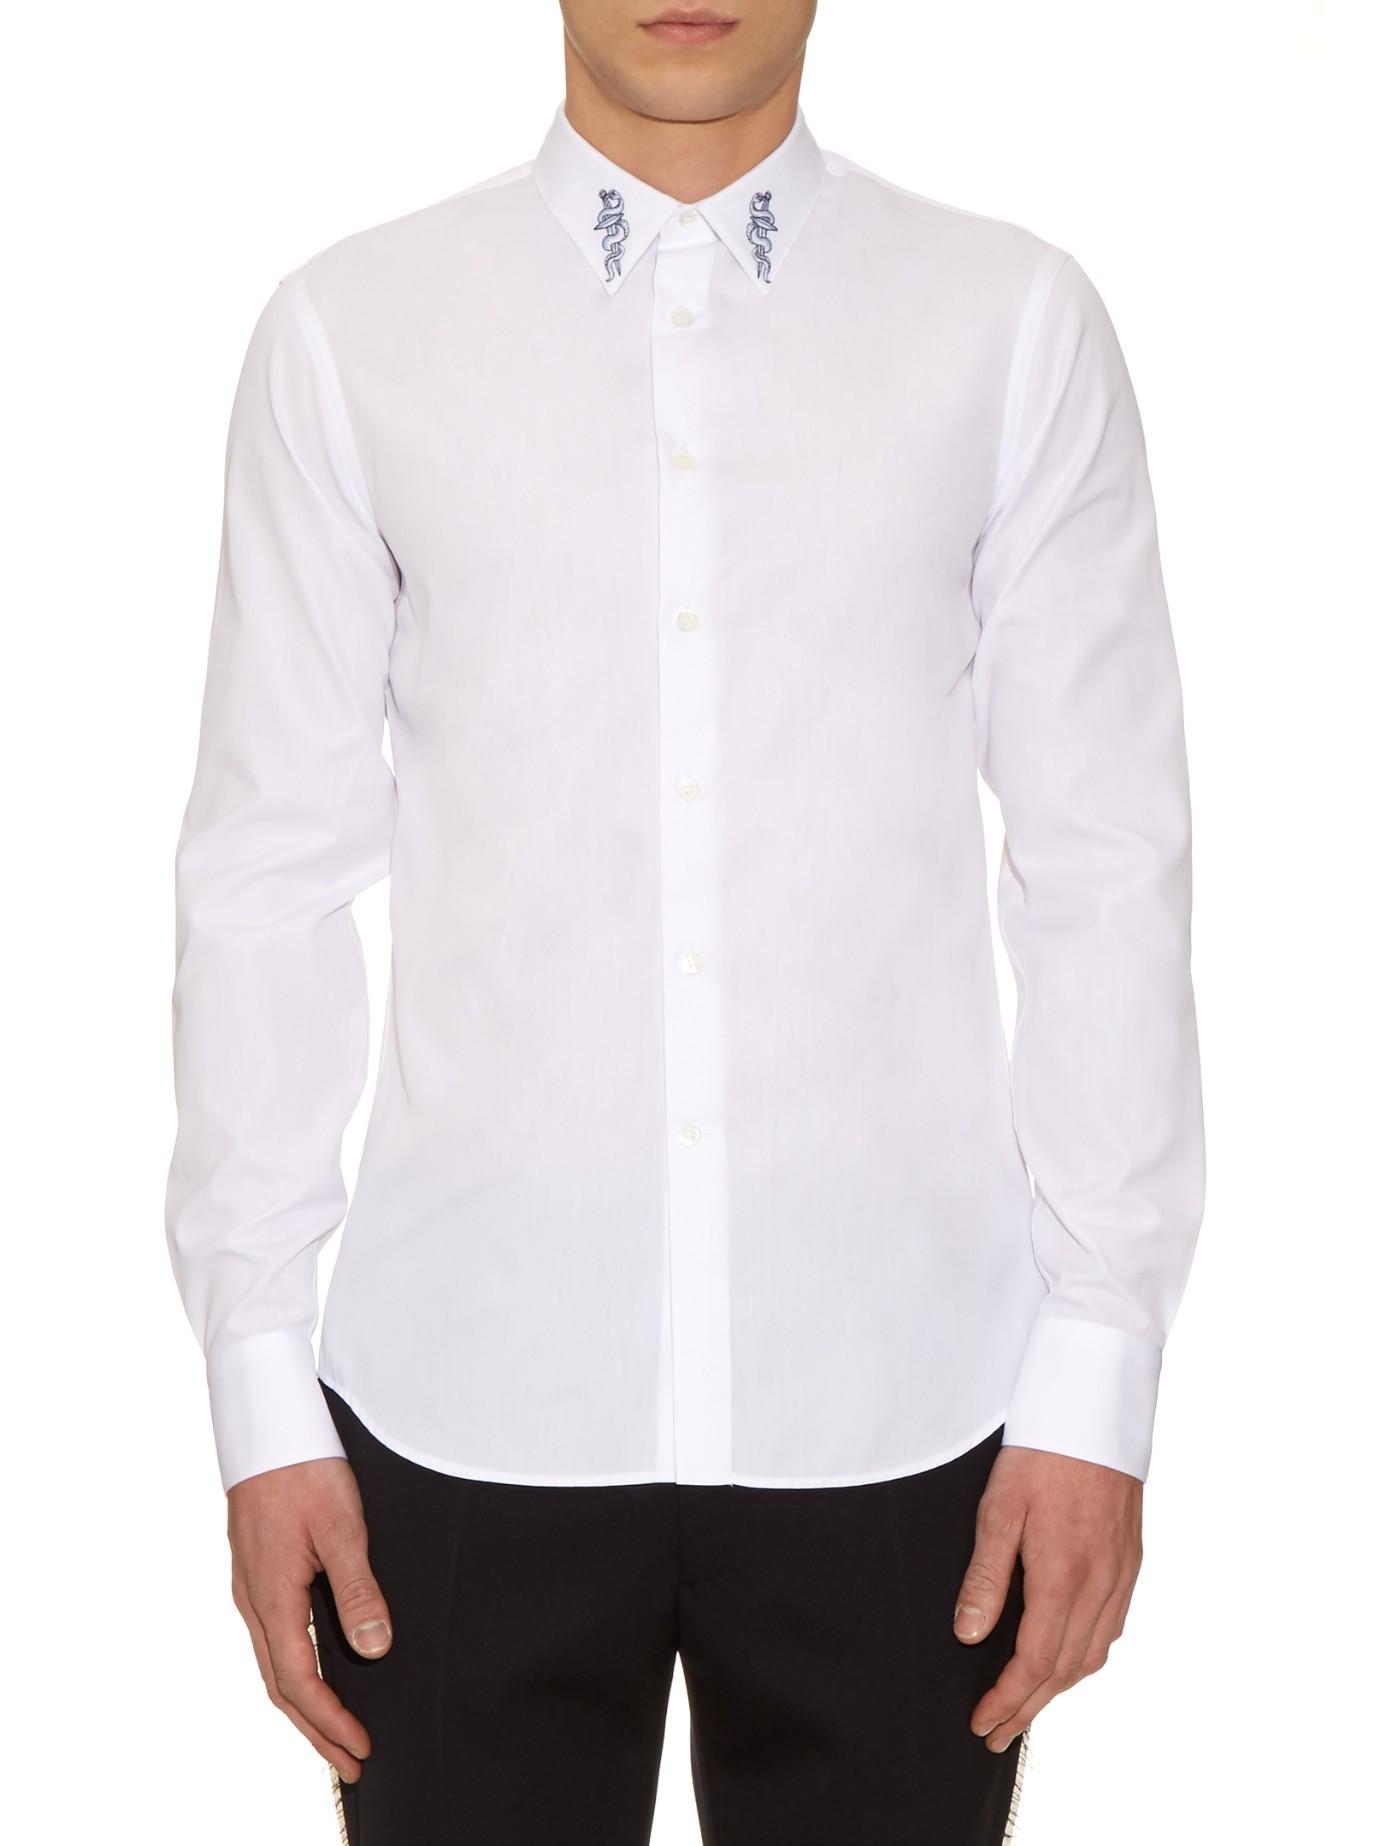 Lyst Alexander Mcqueen Embroidered Collar Cotton Shirt In White